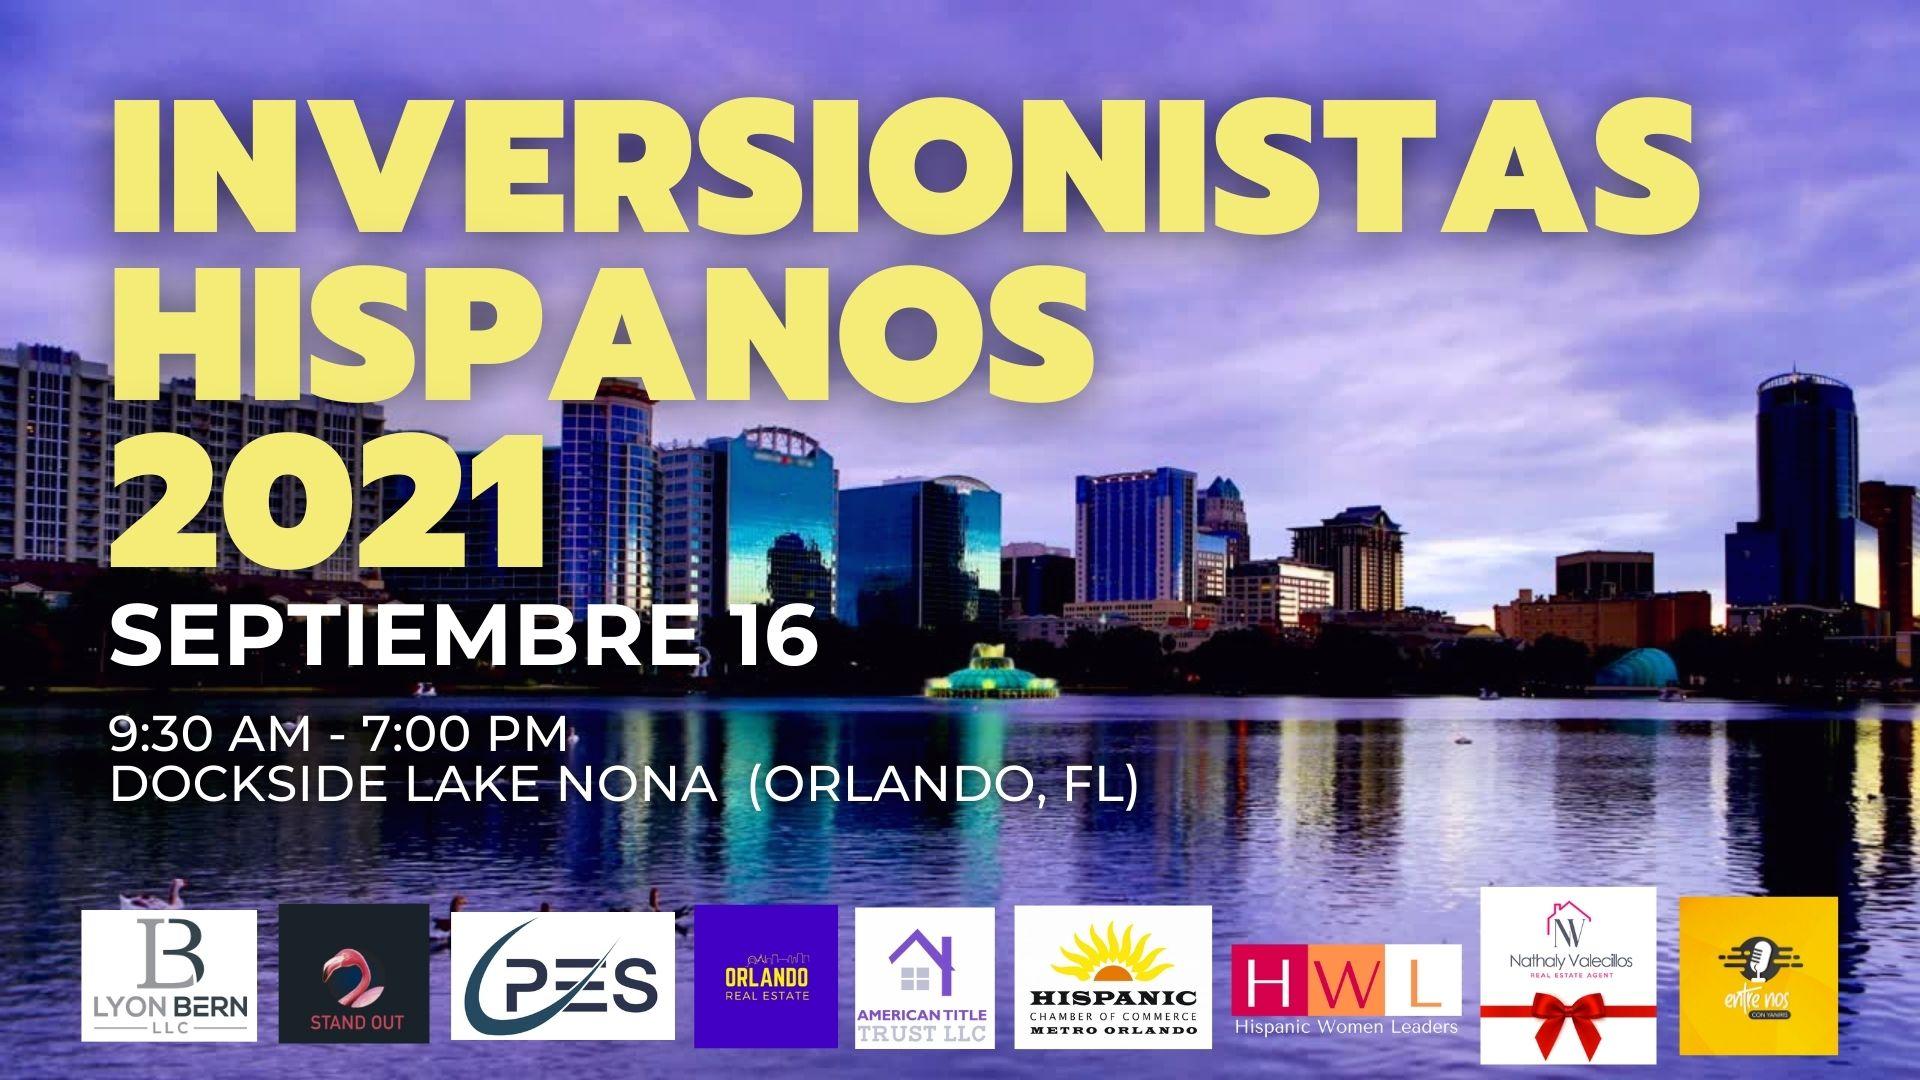 Inversionistas Hispanos 2021 in Lake Nona Orlando